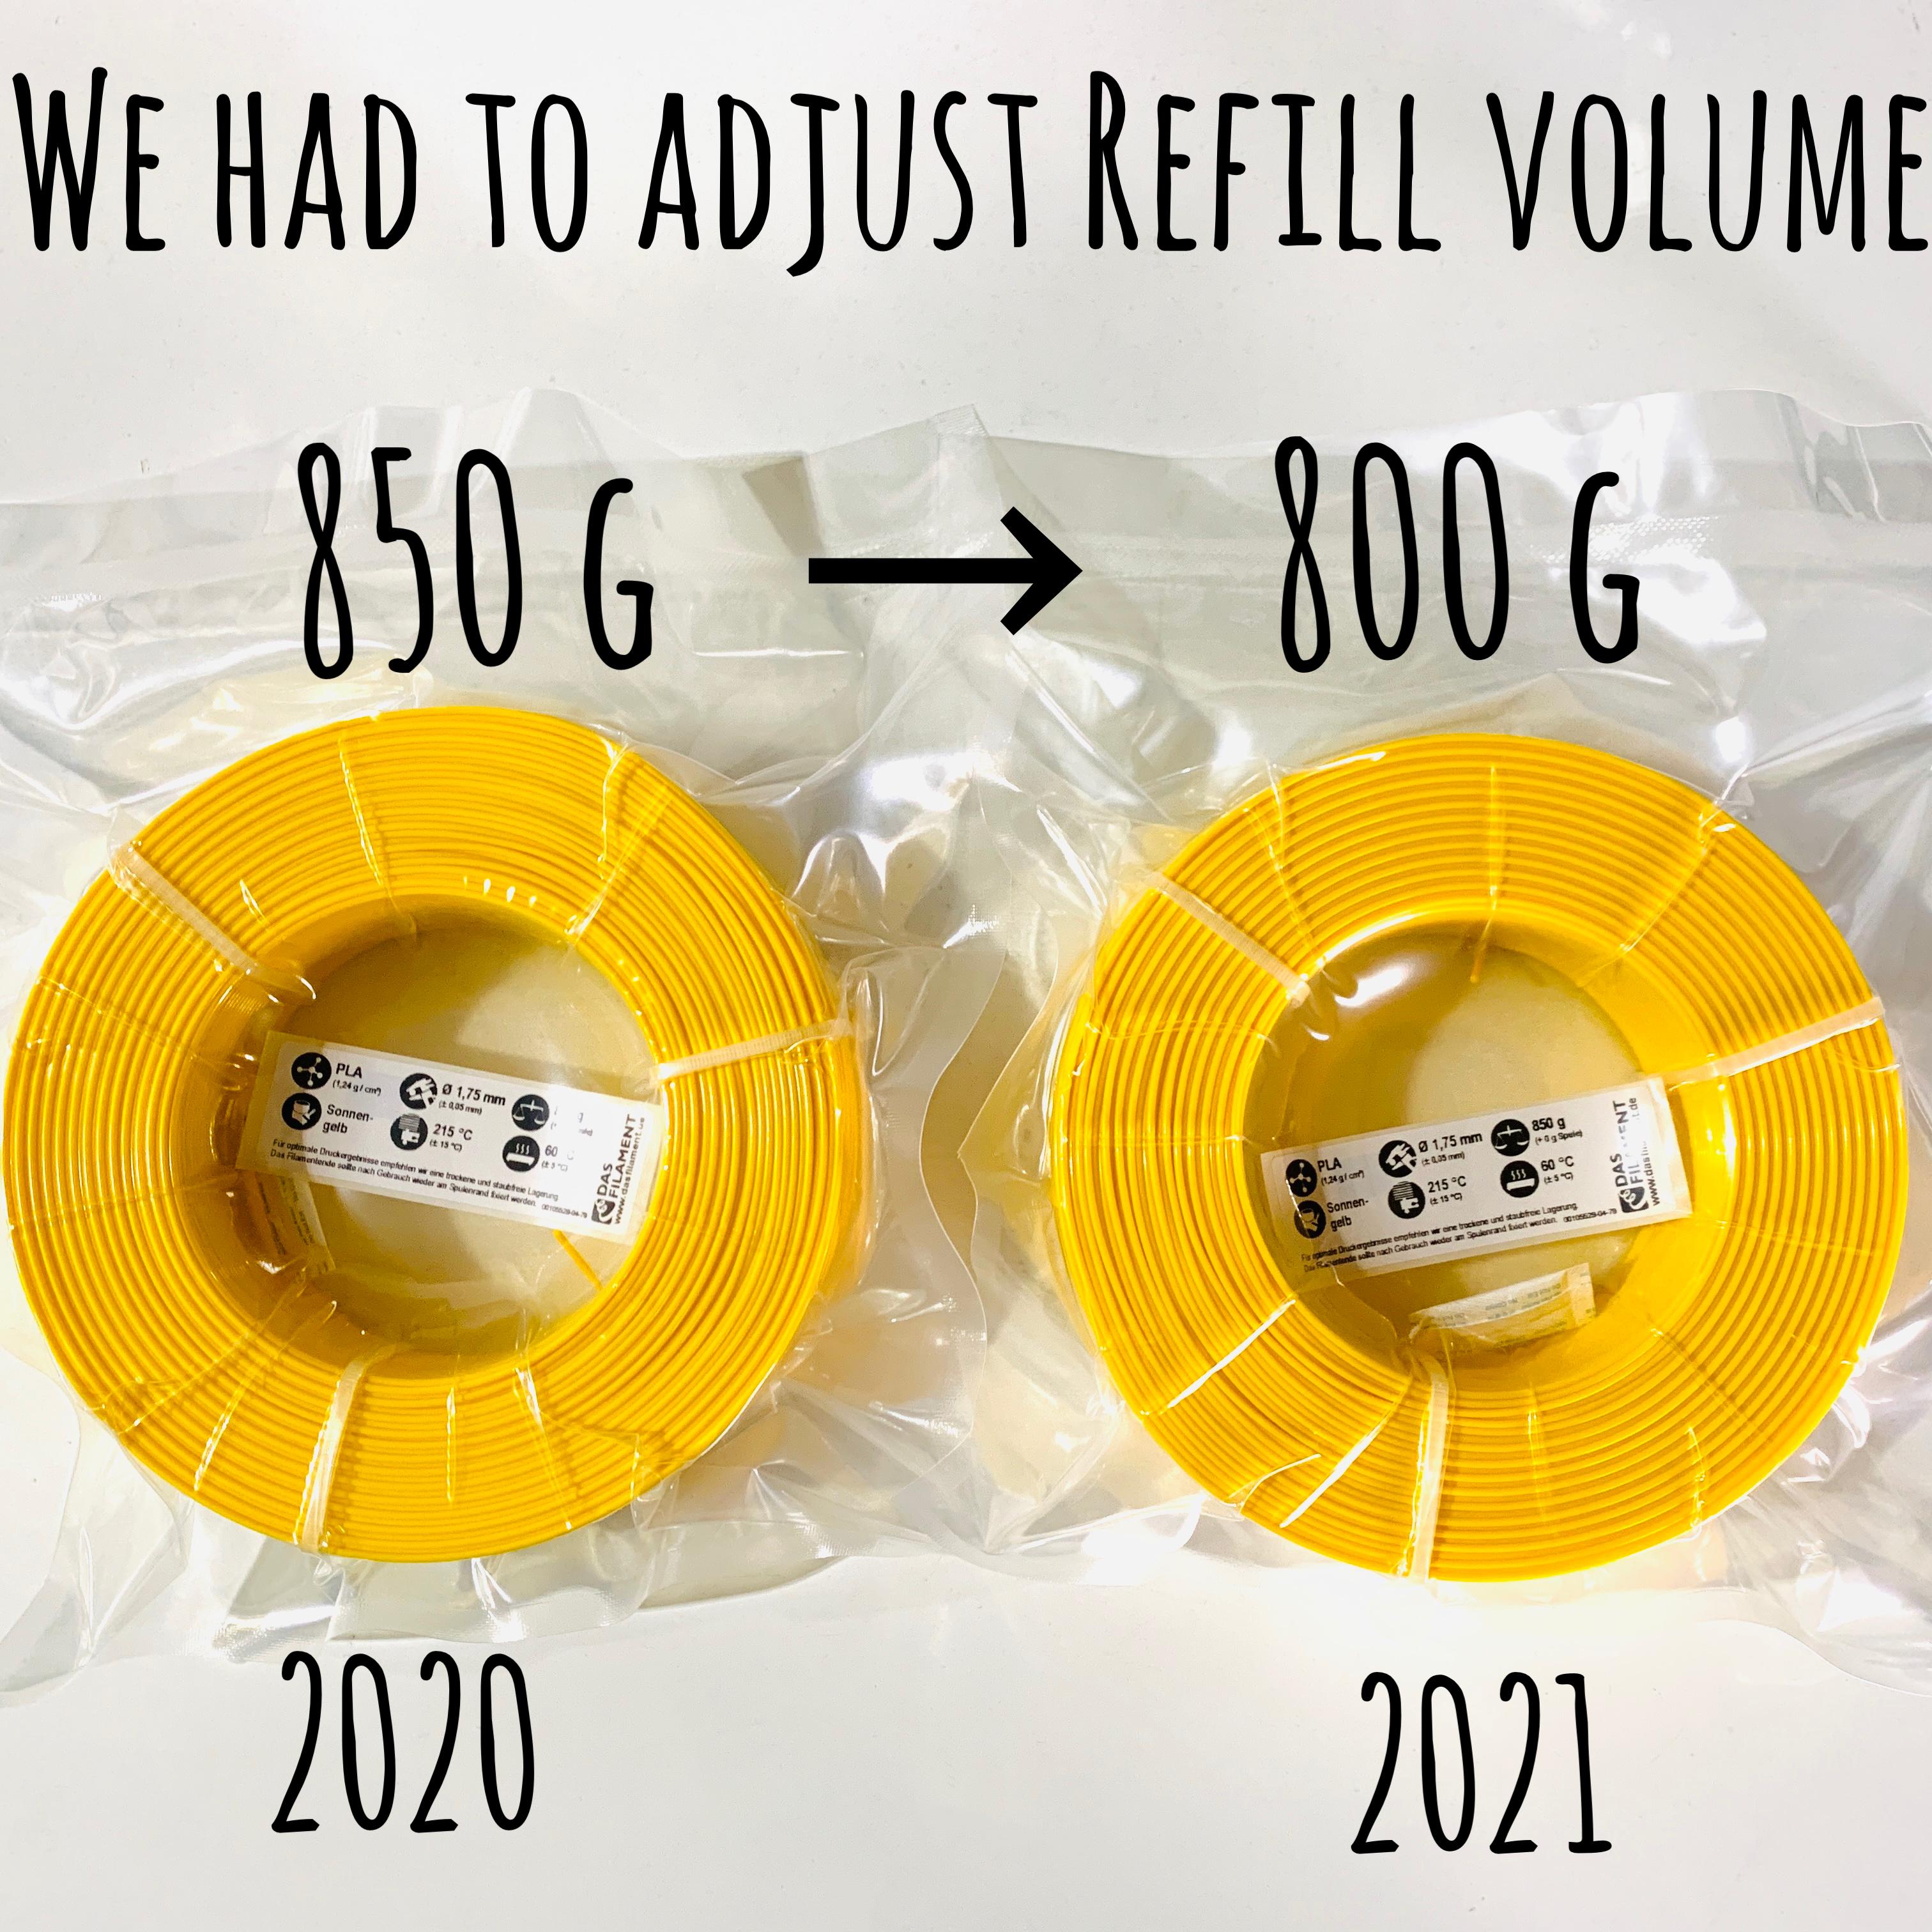 Refill-Wickelvolumen auf 800 g angepasst